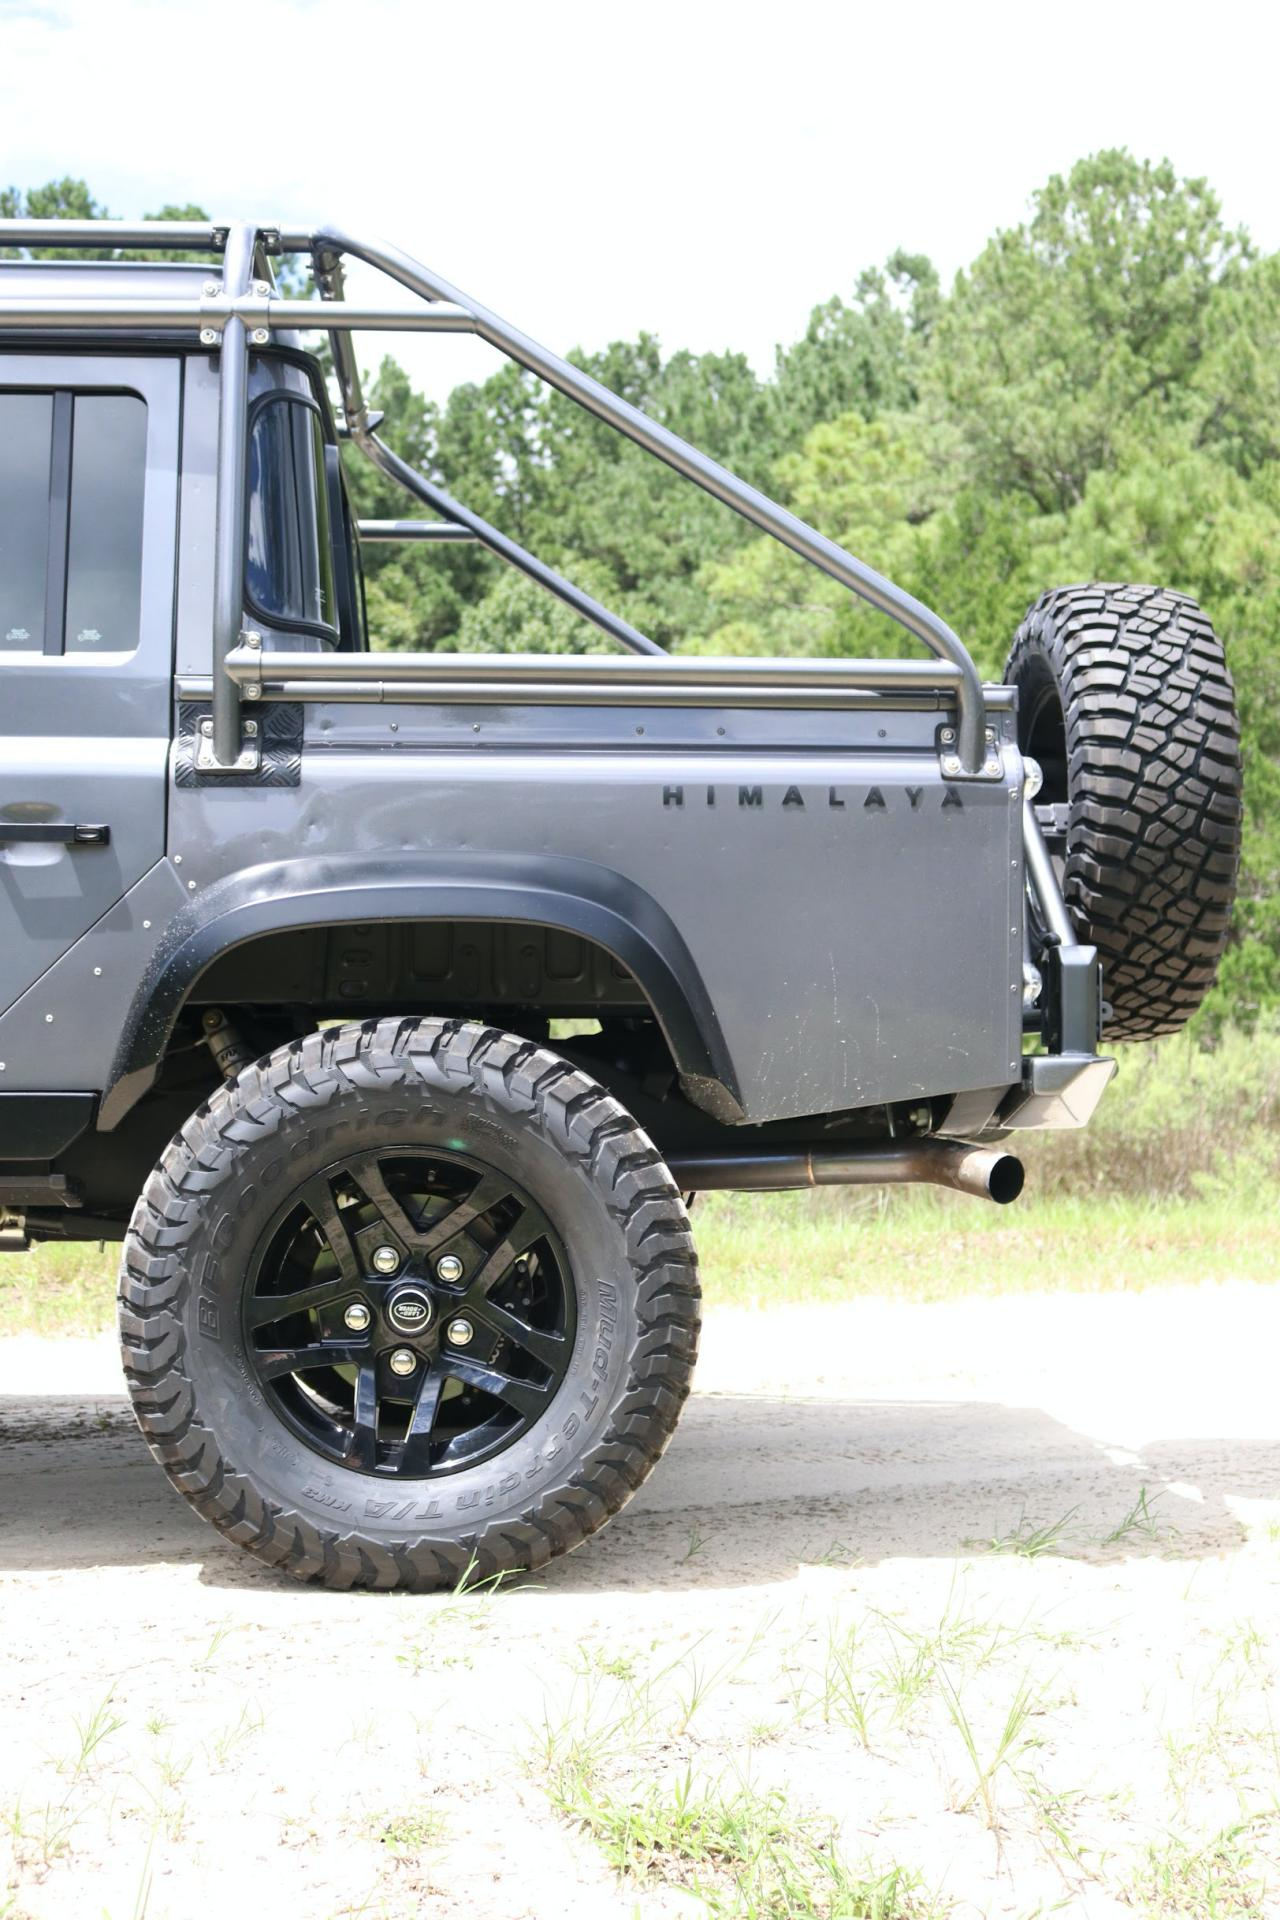 Land_Rover_Defender_by_Himalaya_0006